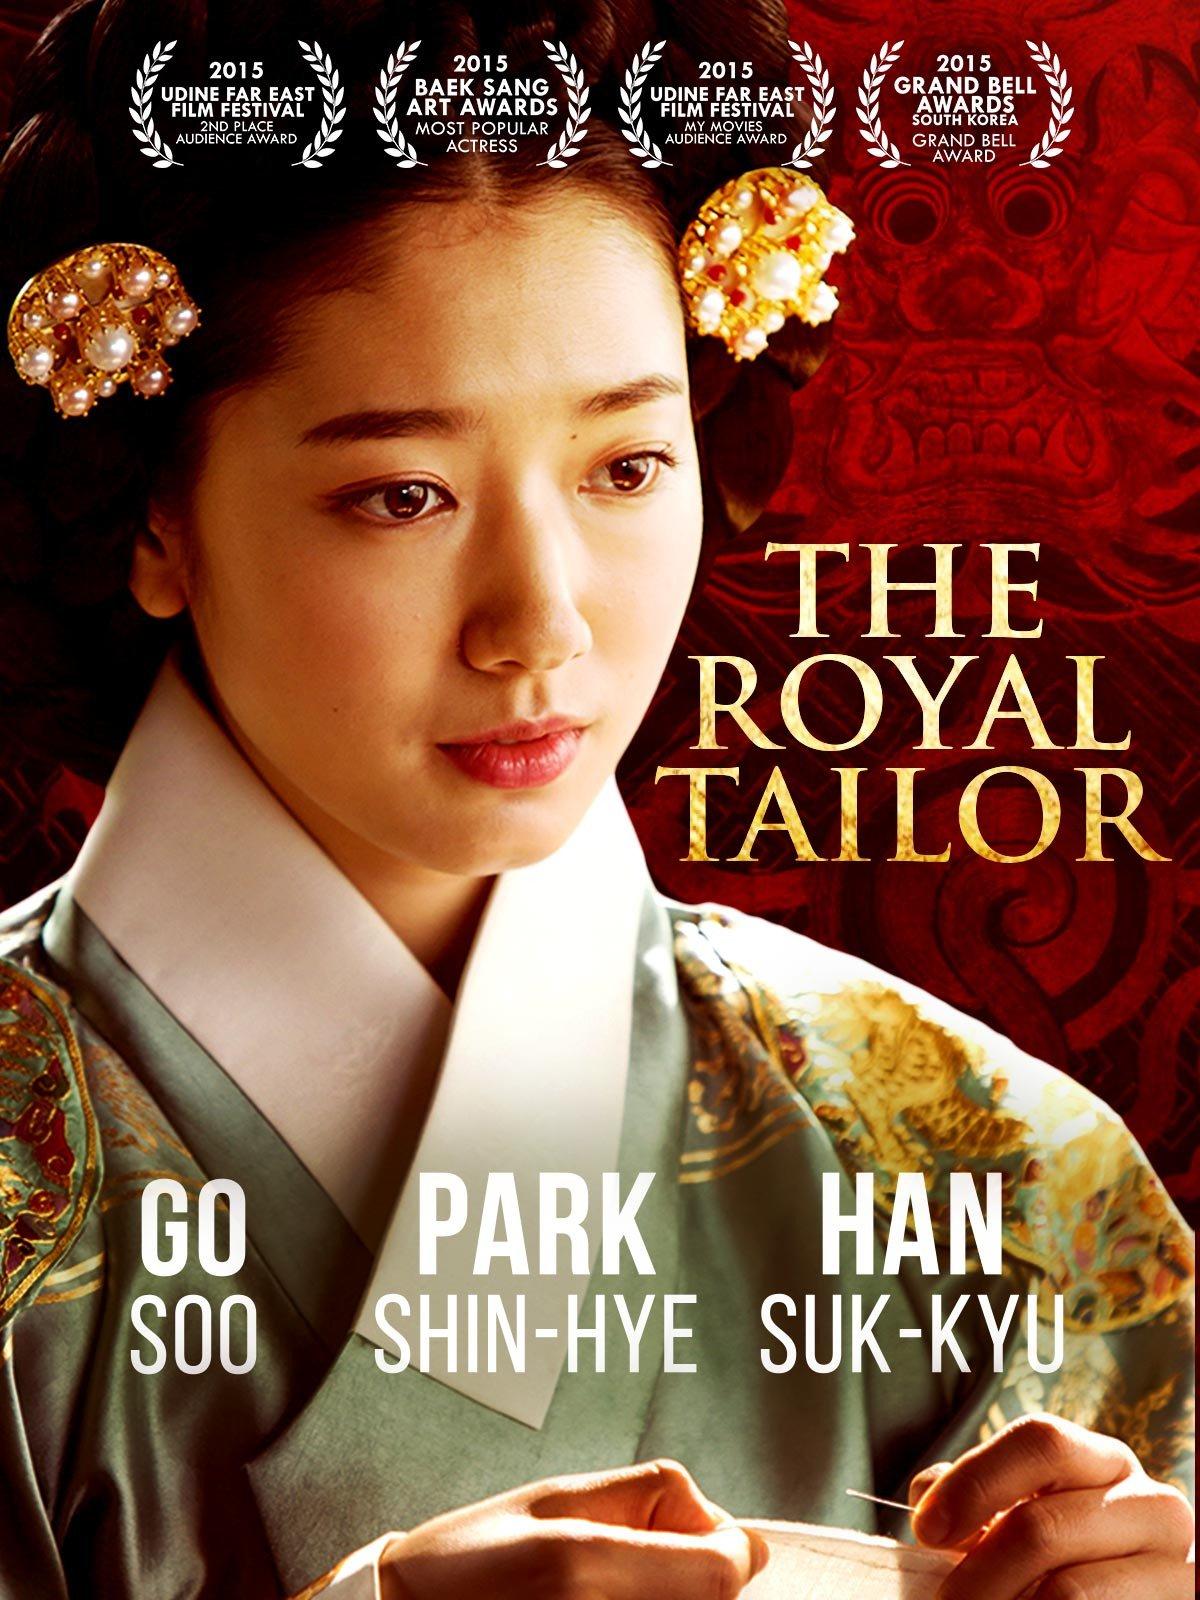 cd do royal tailor